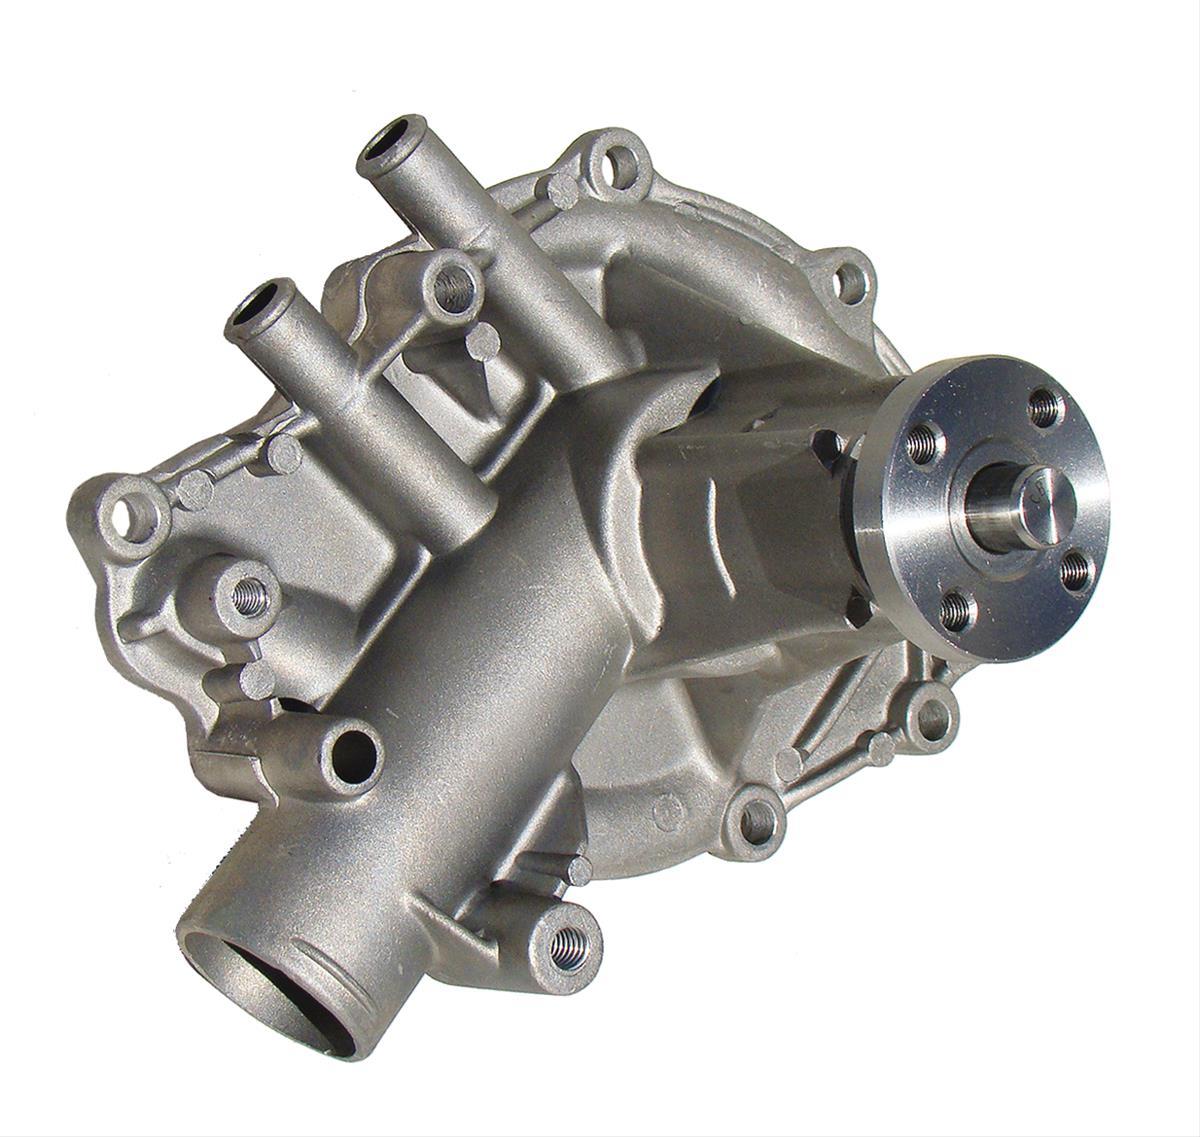 Milodon Mechanical Water Pump 16232 Ford SB 289 302 351W High-Volume Aluminum